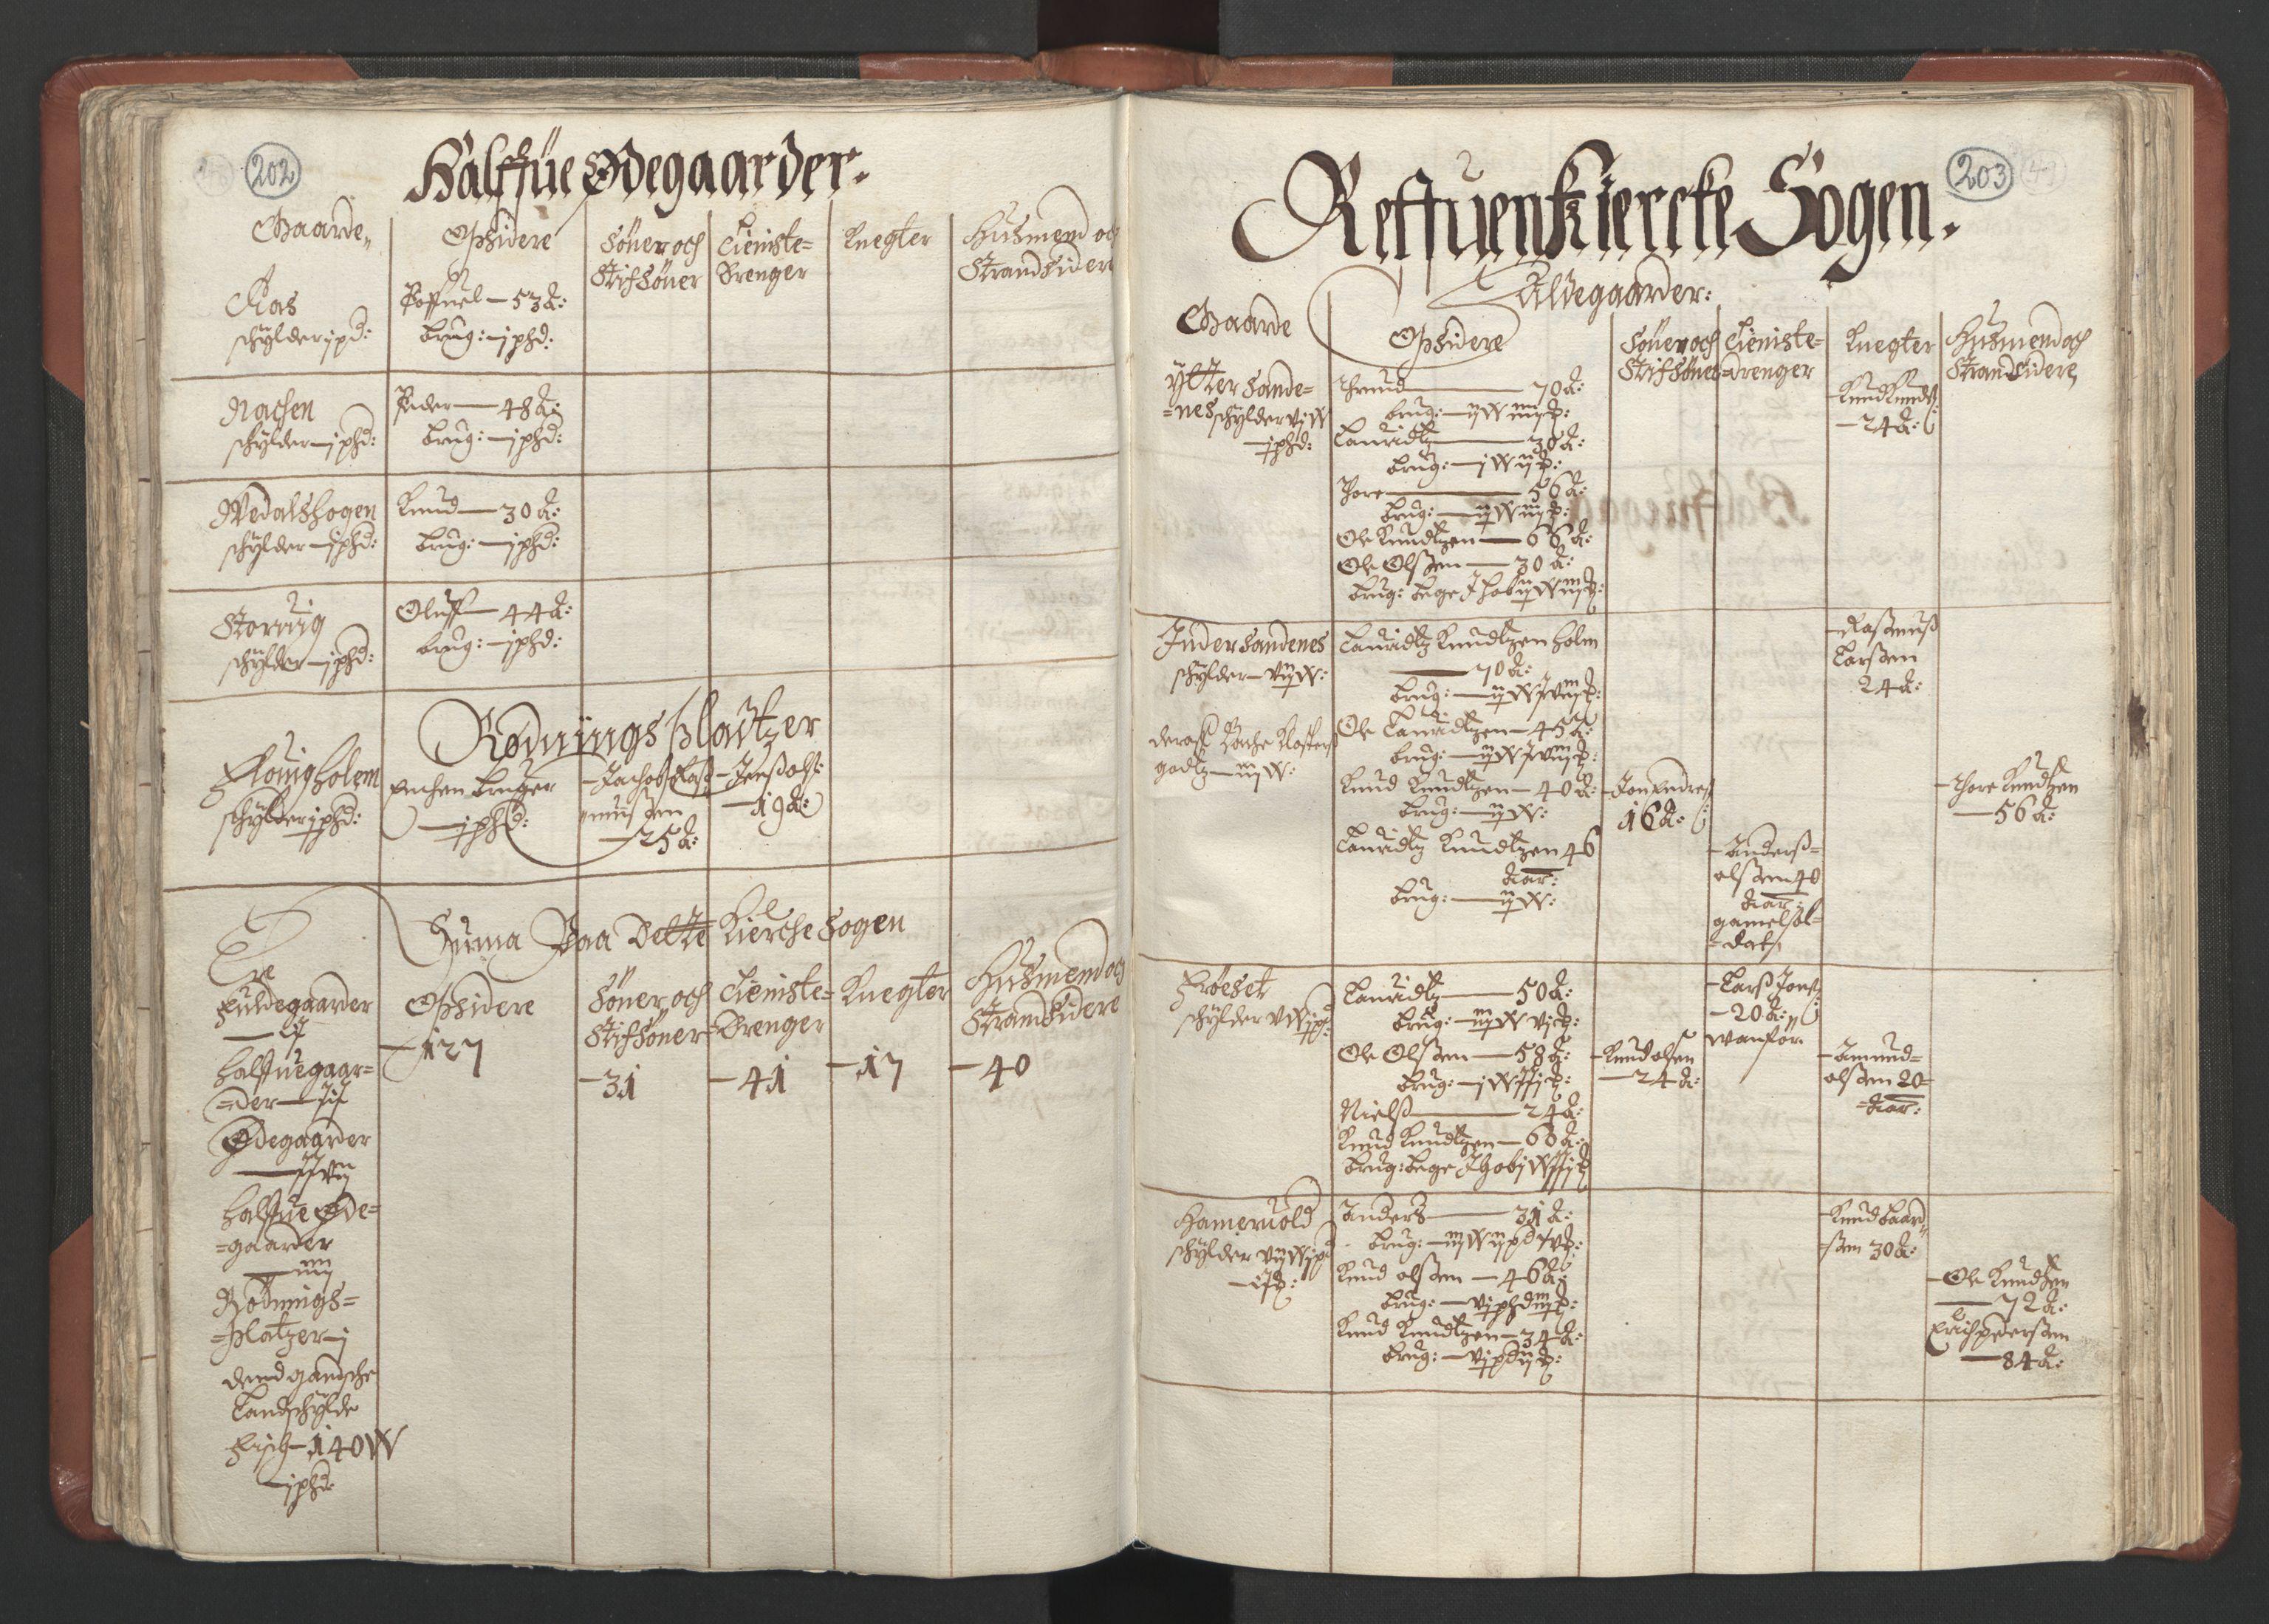 RA, Fogdenes og sorenskrivernes manntall 1664-1666, nr. 16: Romsdal fogderi og Sunnmøre fogderi, 1664-1665, s. 202-203